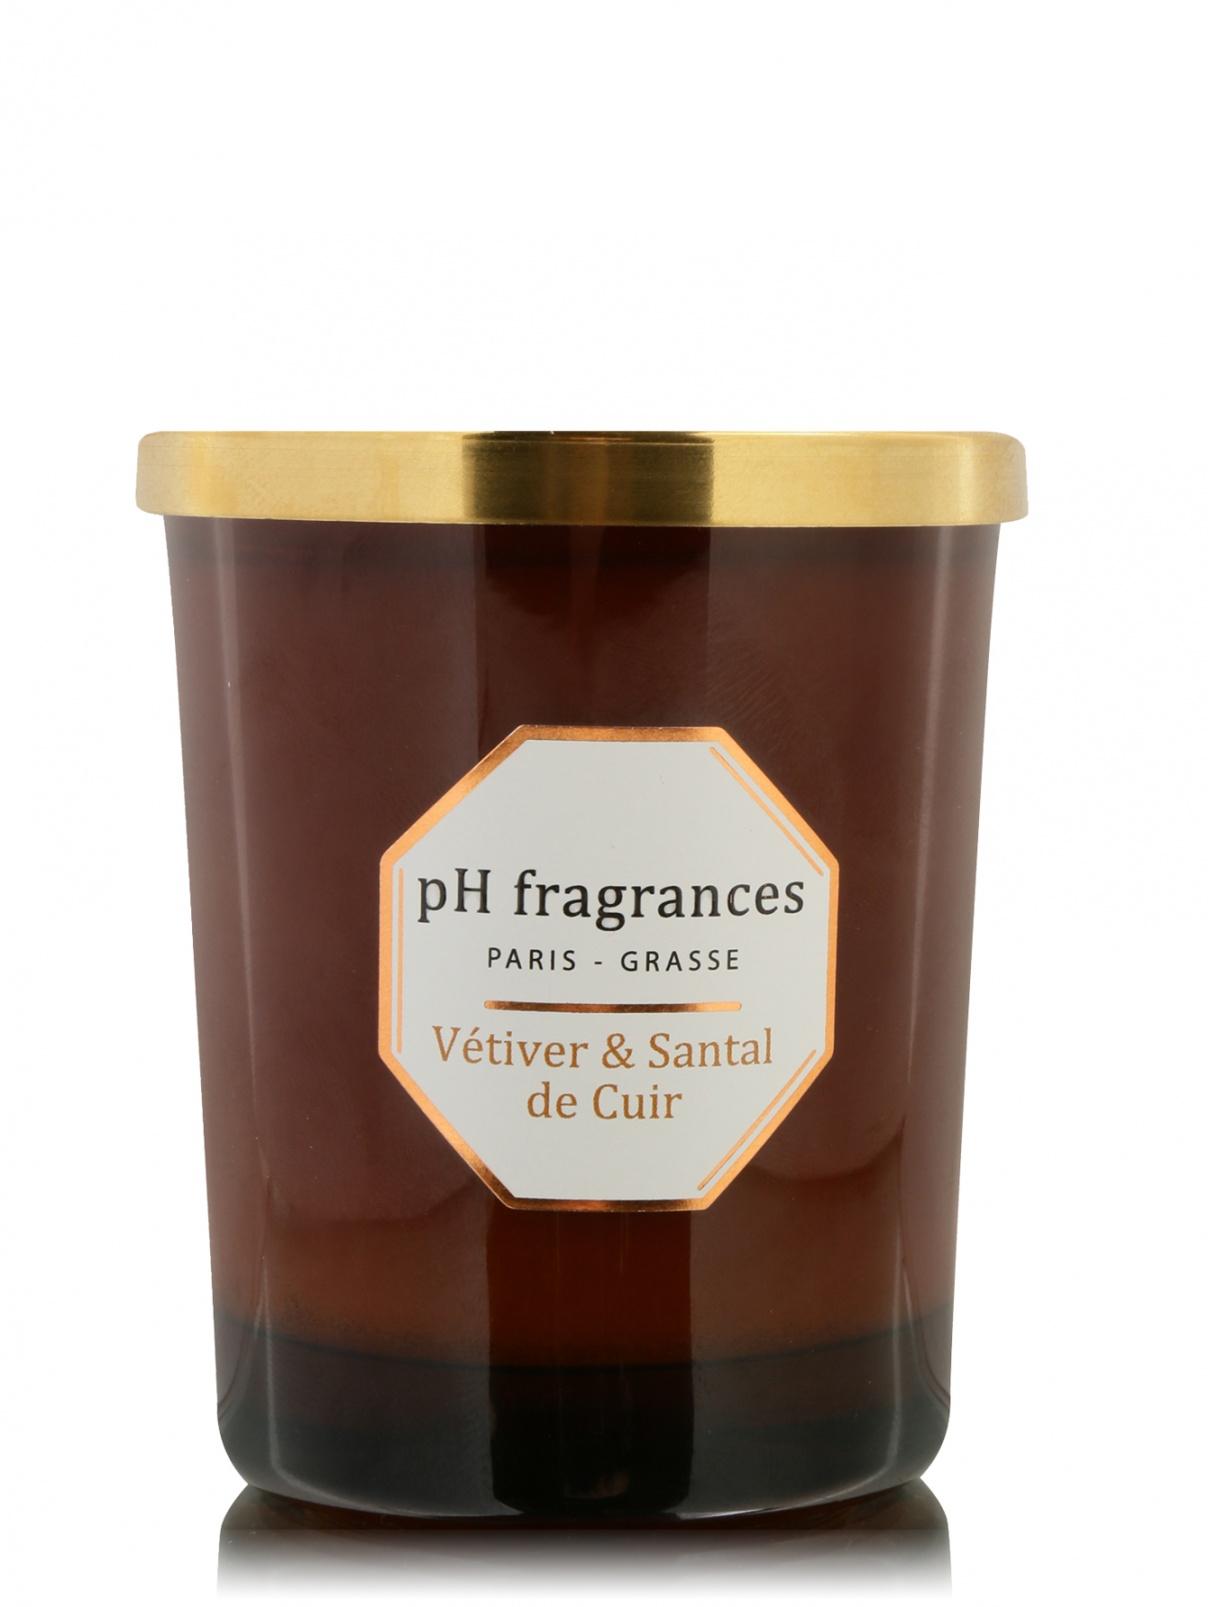 Свеча Vetiver & Santal De Cuir PH FRAGRANCES PH Fragrances  –  Общий вид